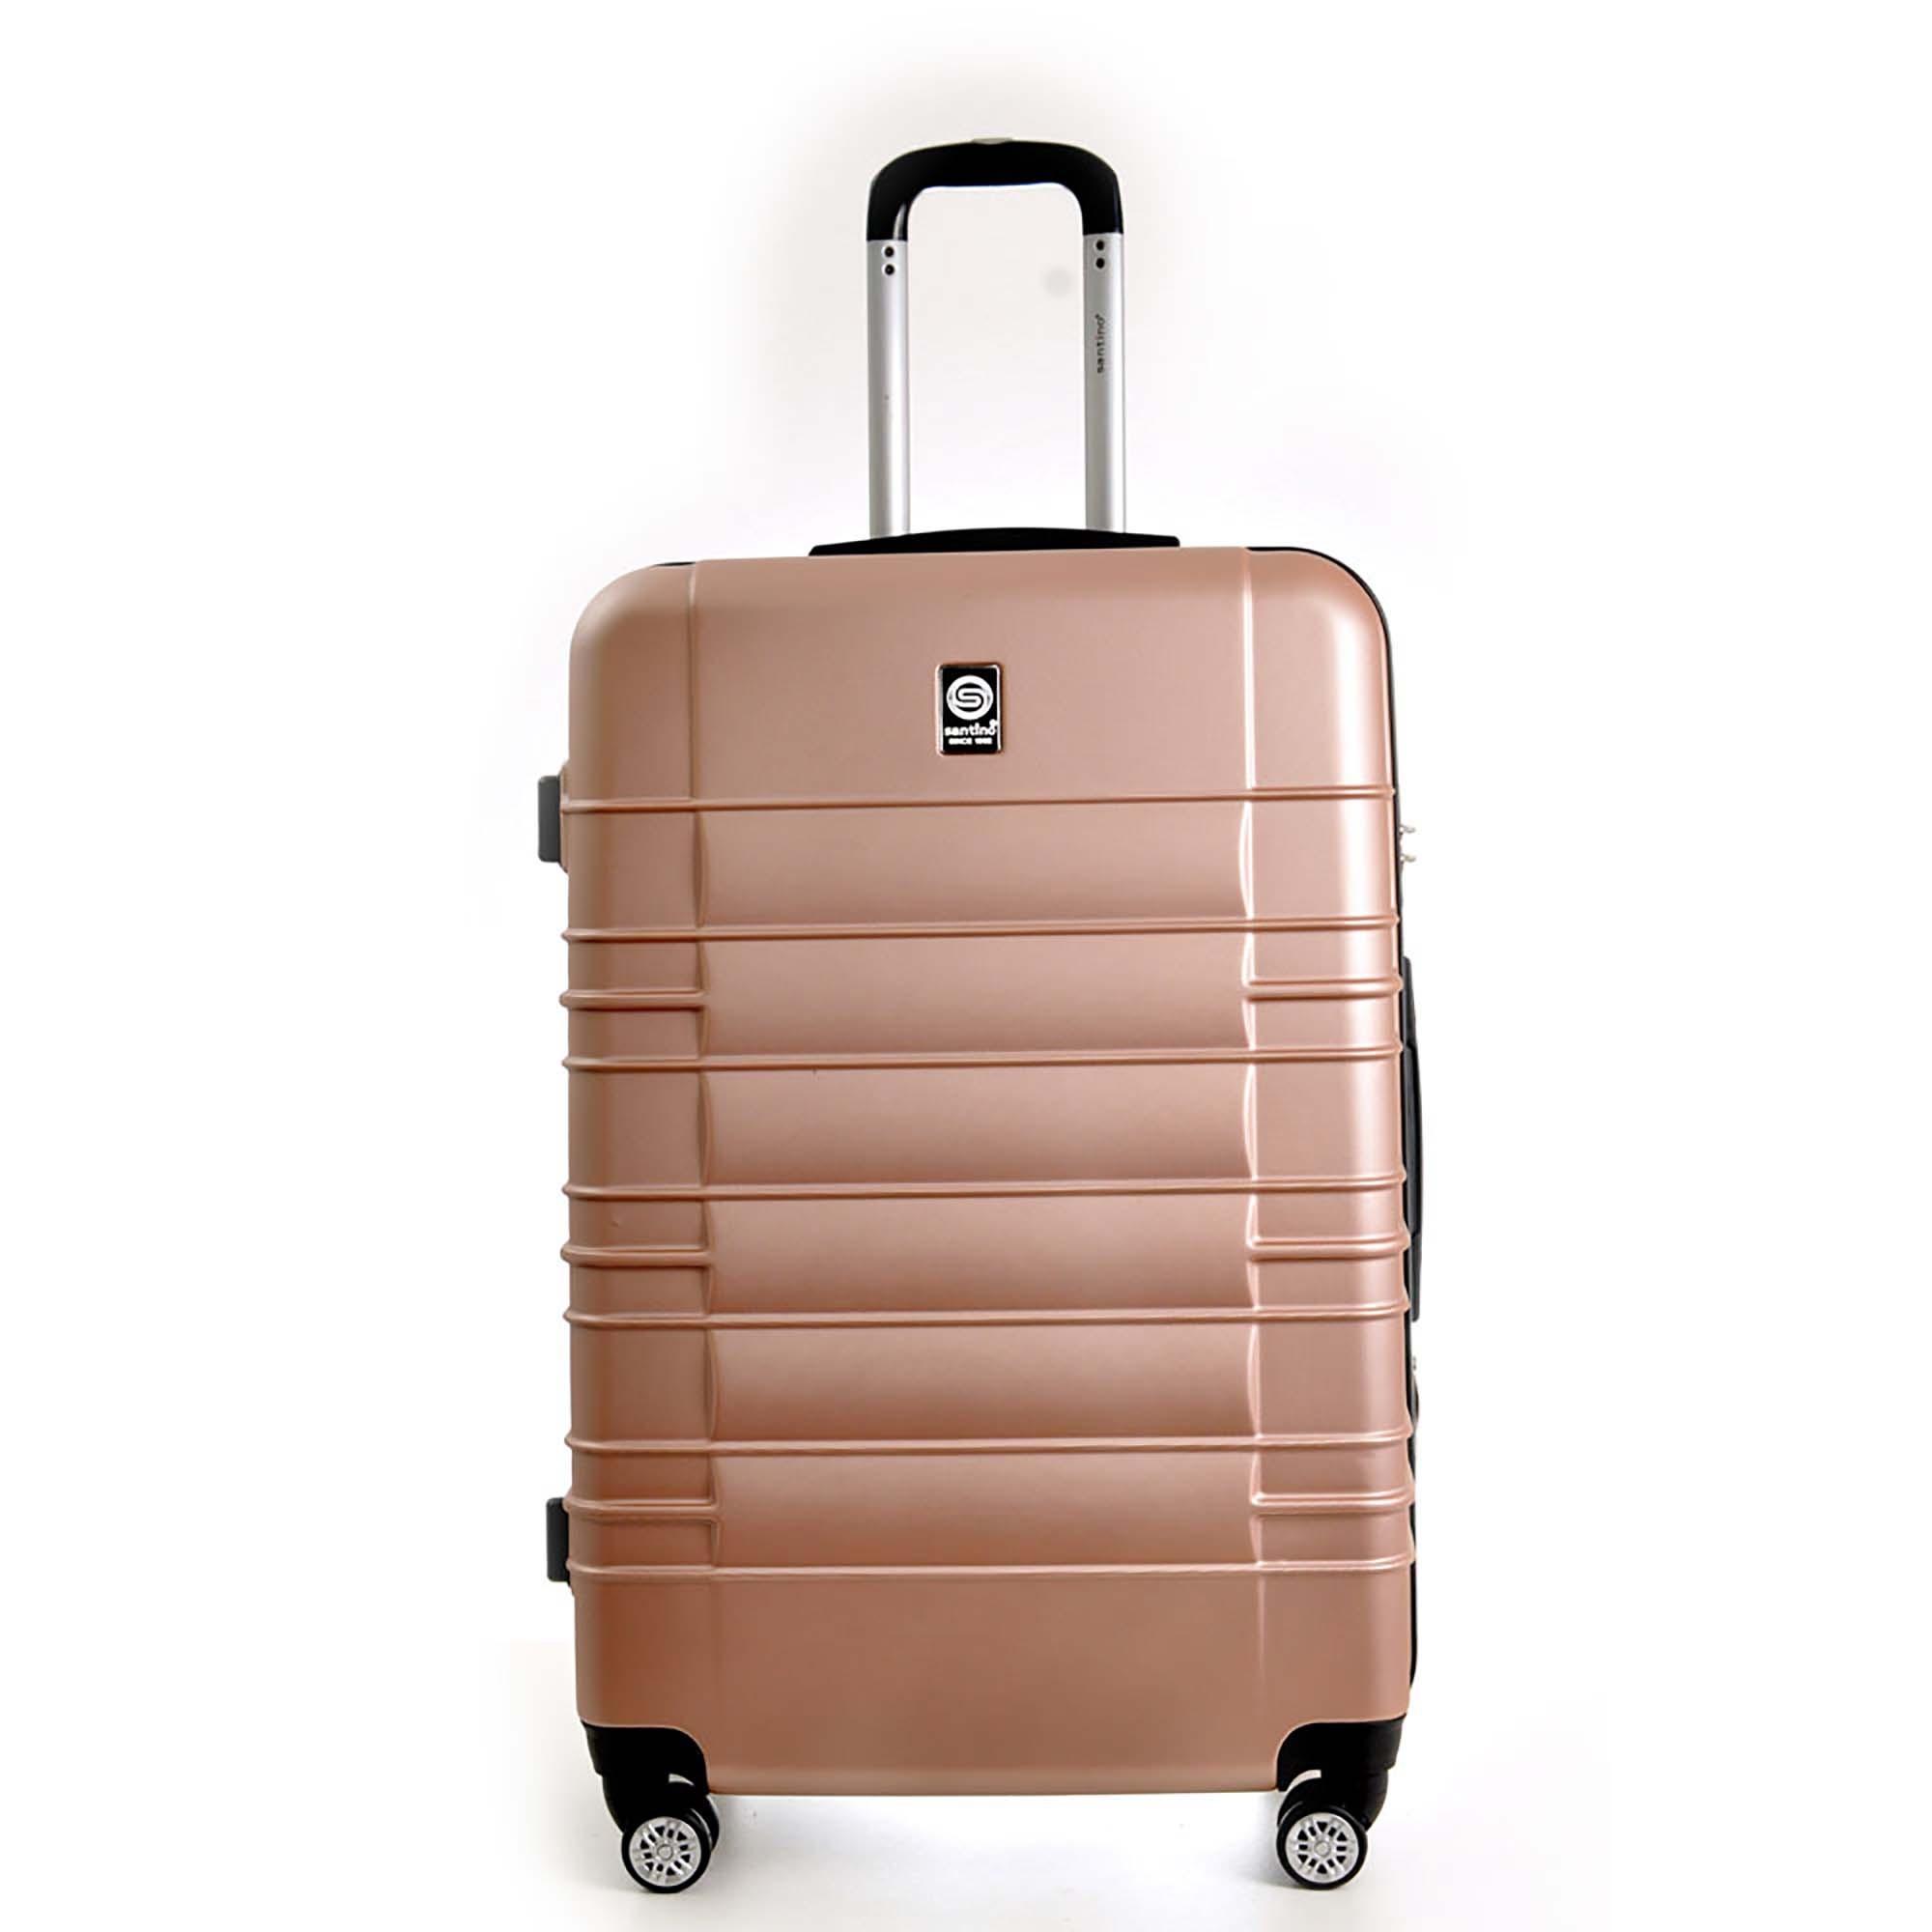 MALA VIAGEM SANT ABS GDE TSA  ROSA - ASAV8001G05